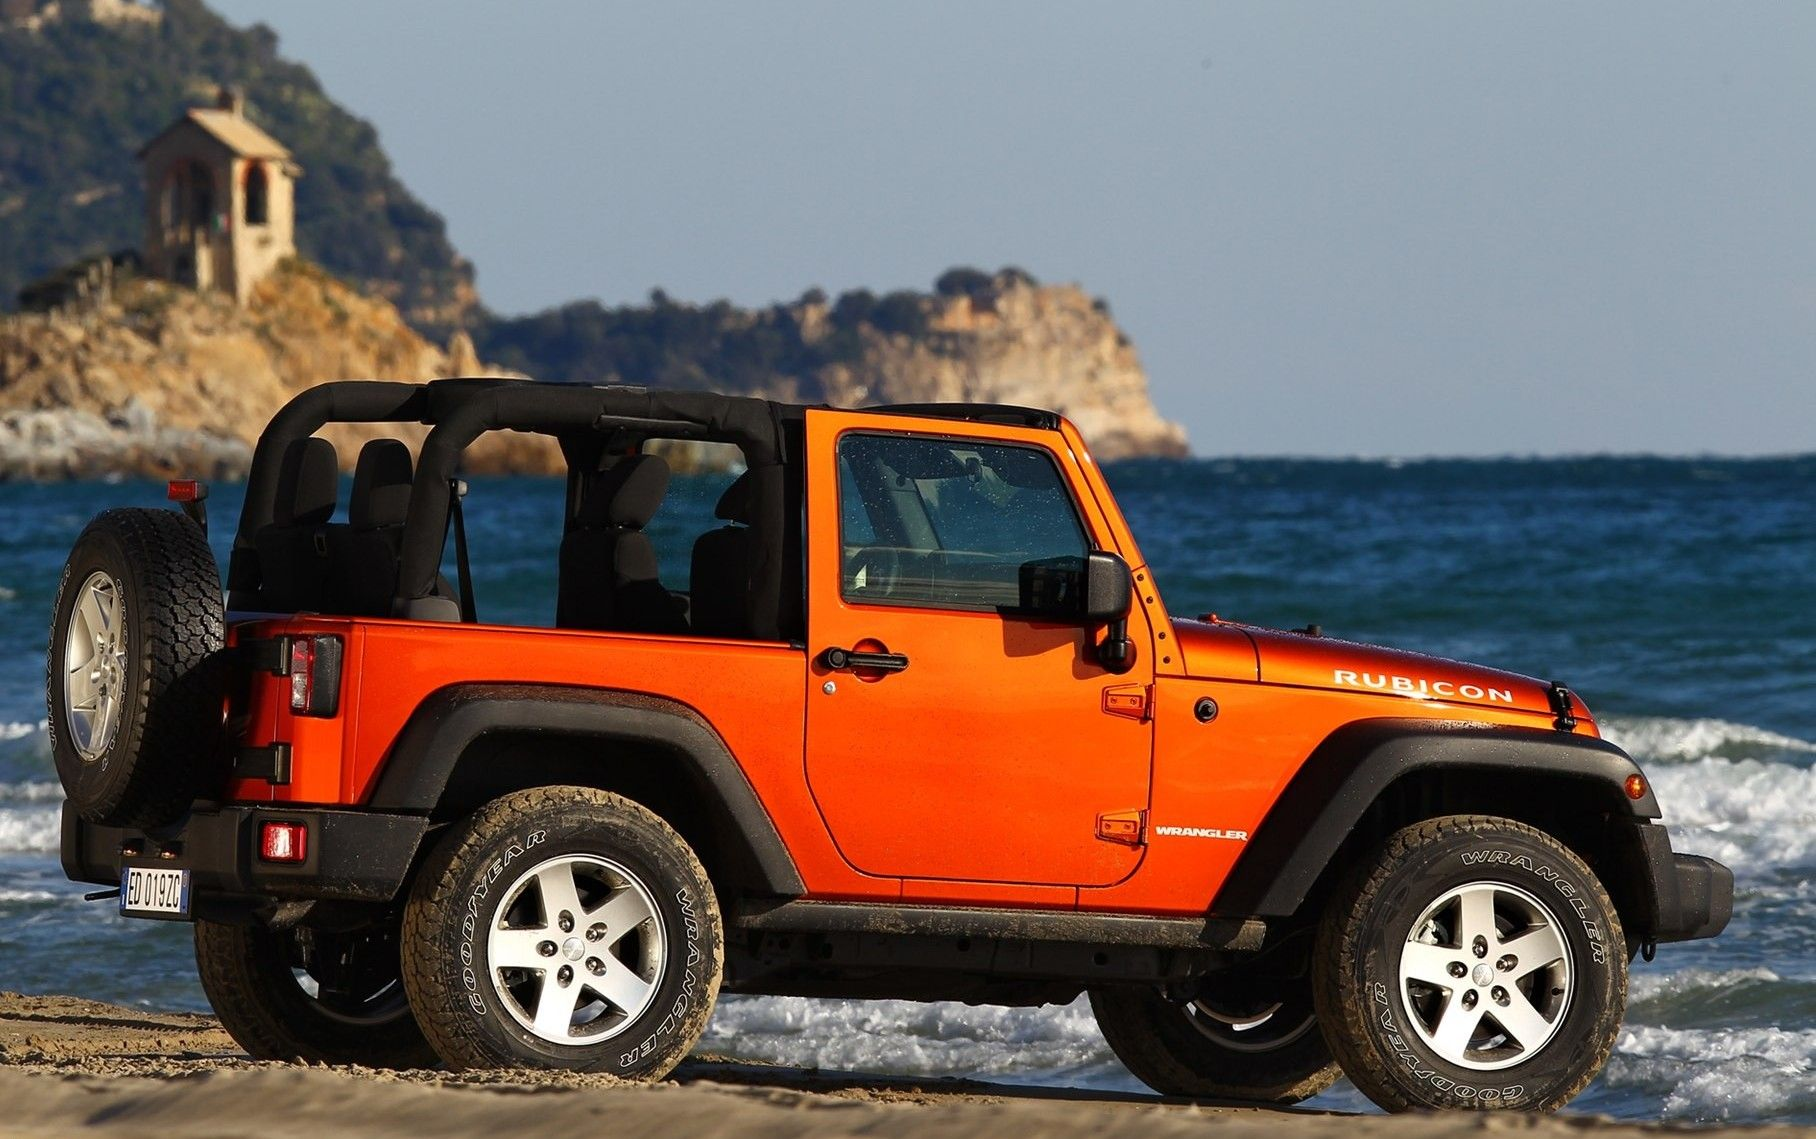 Jeep Wrangler Rubicon Orange Image 2012 Jeep Wrangler Orange